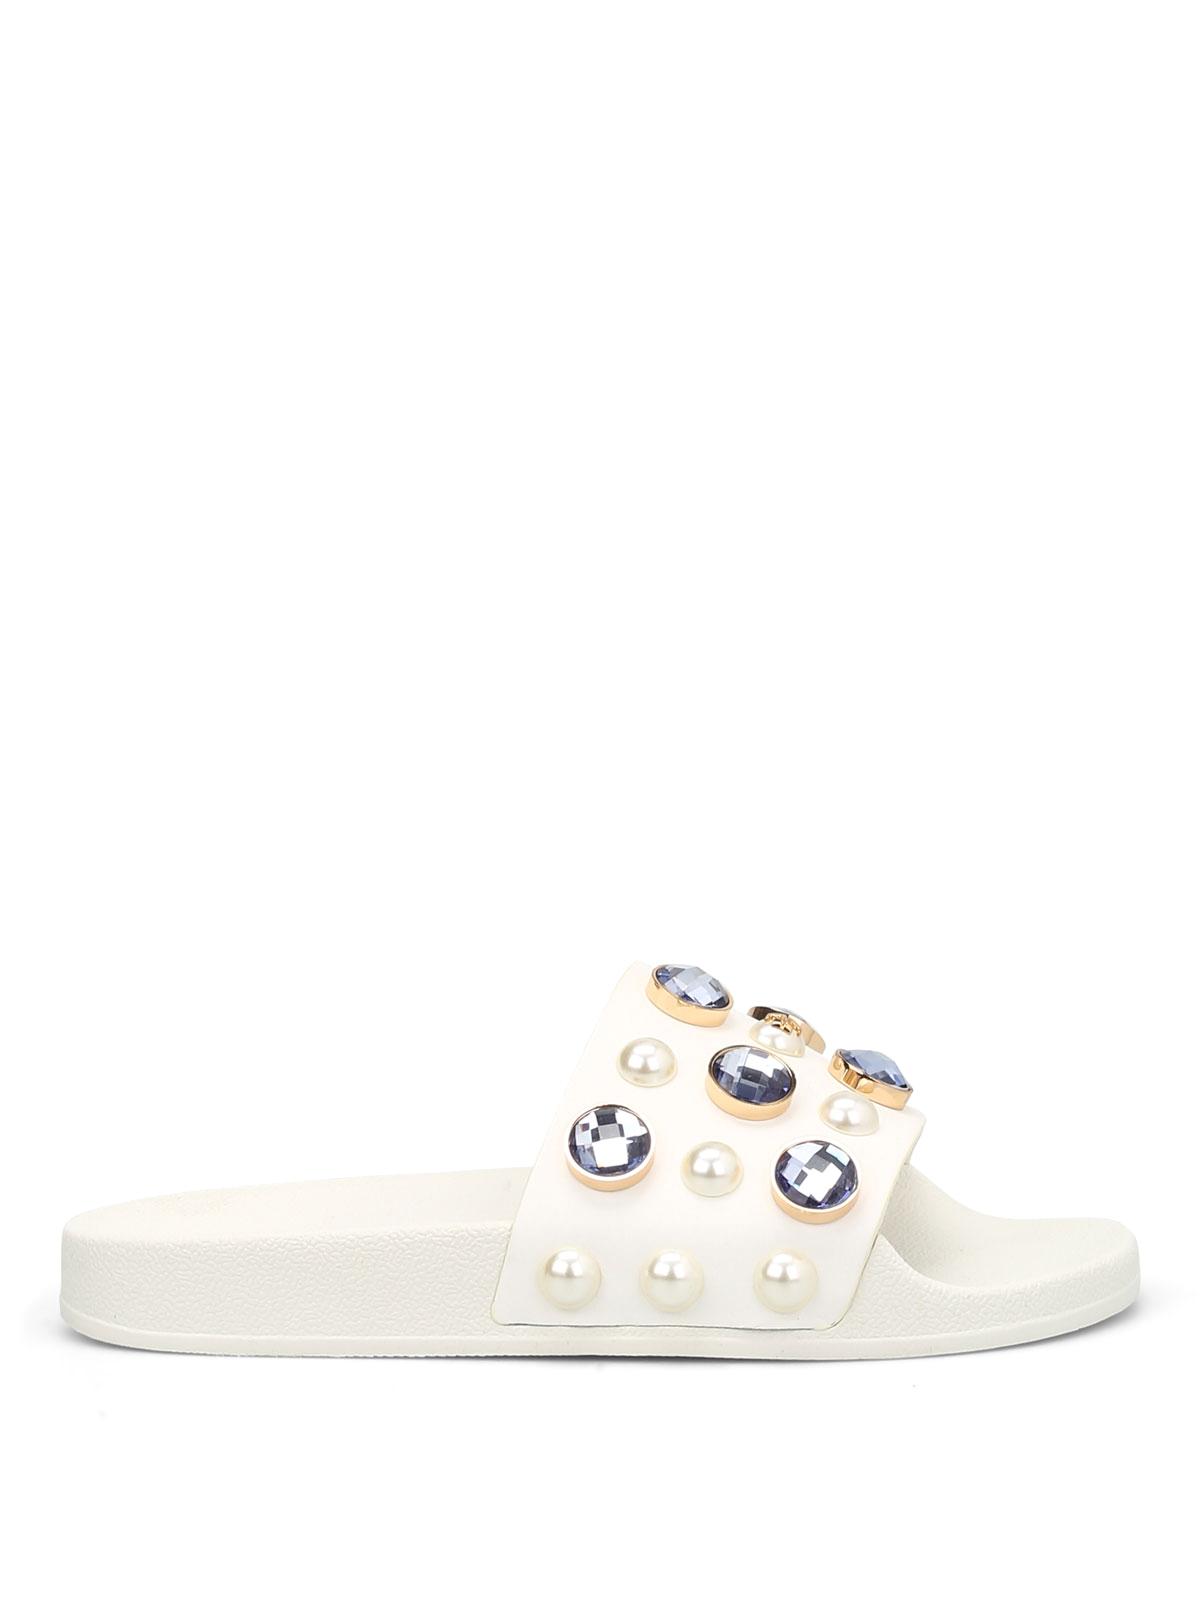 7c3901271f000 Tory Burch - Vail rhinestone and bead sliders - sandals - 35939100